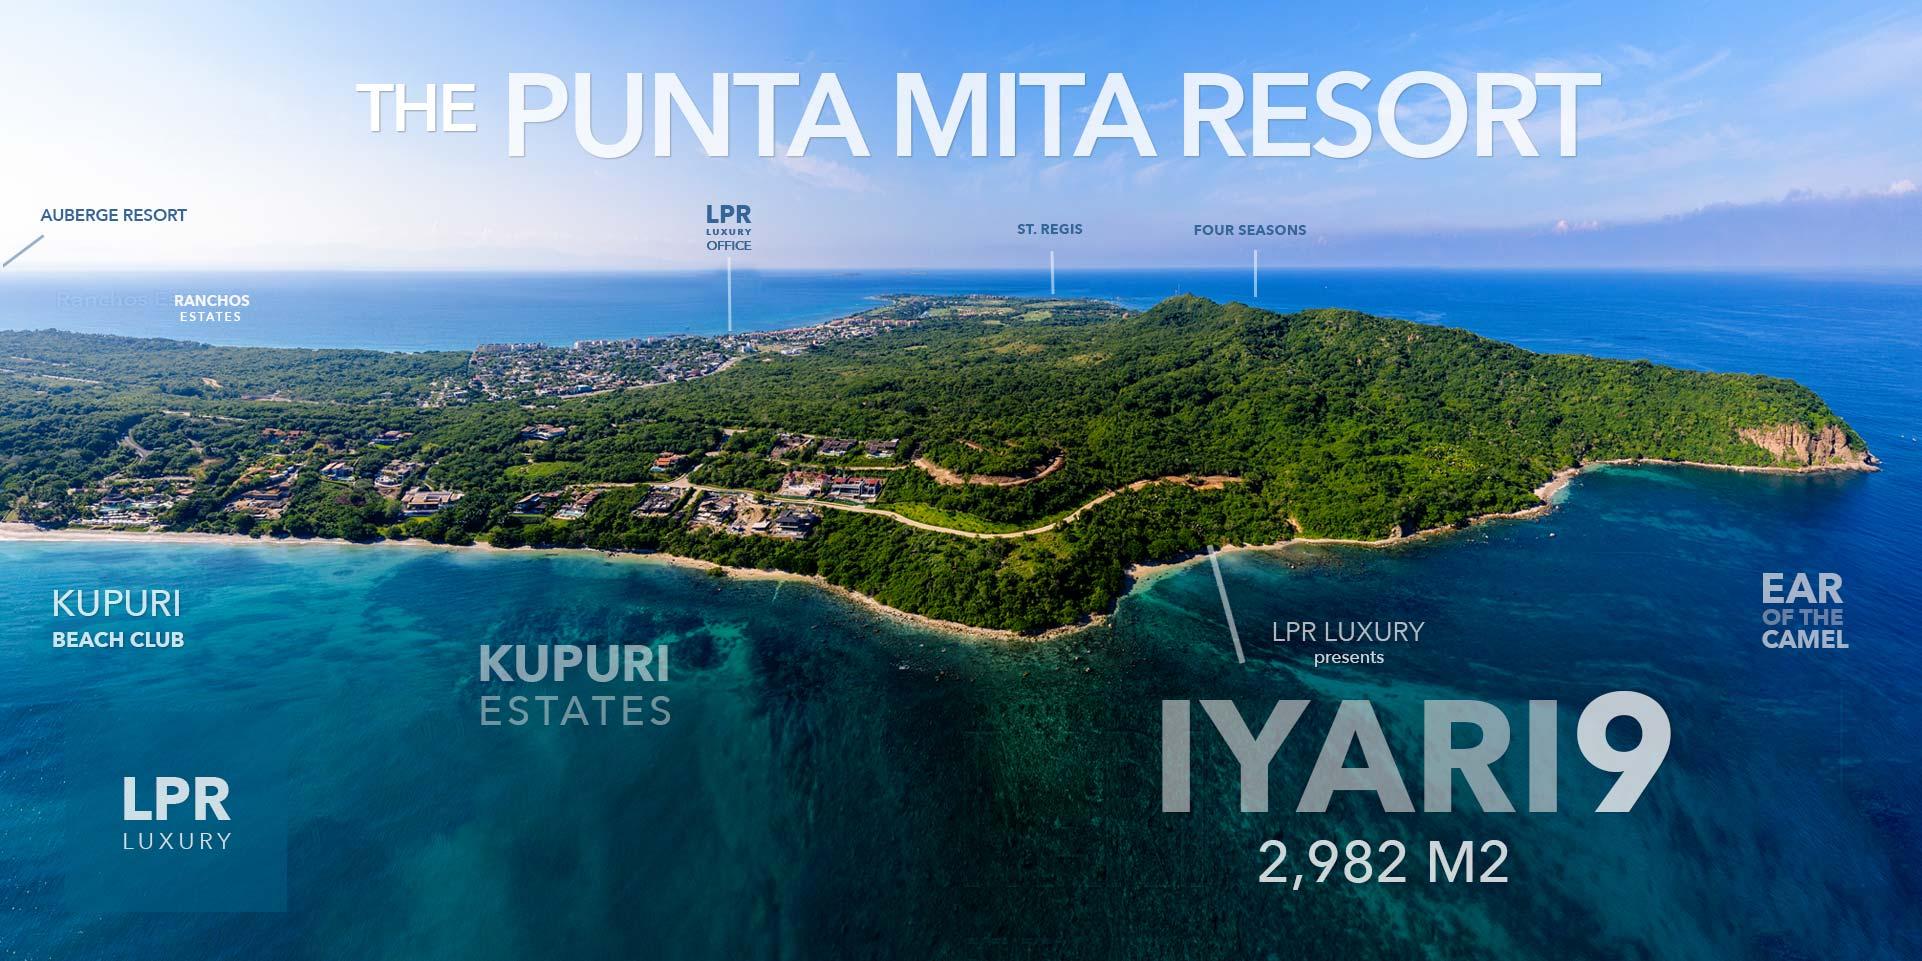 Iyari - Lot 9 - Punta Mita - Luxury real estate - Homes and homesite at the Punta Mita Resort